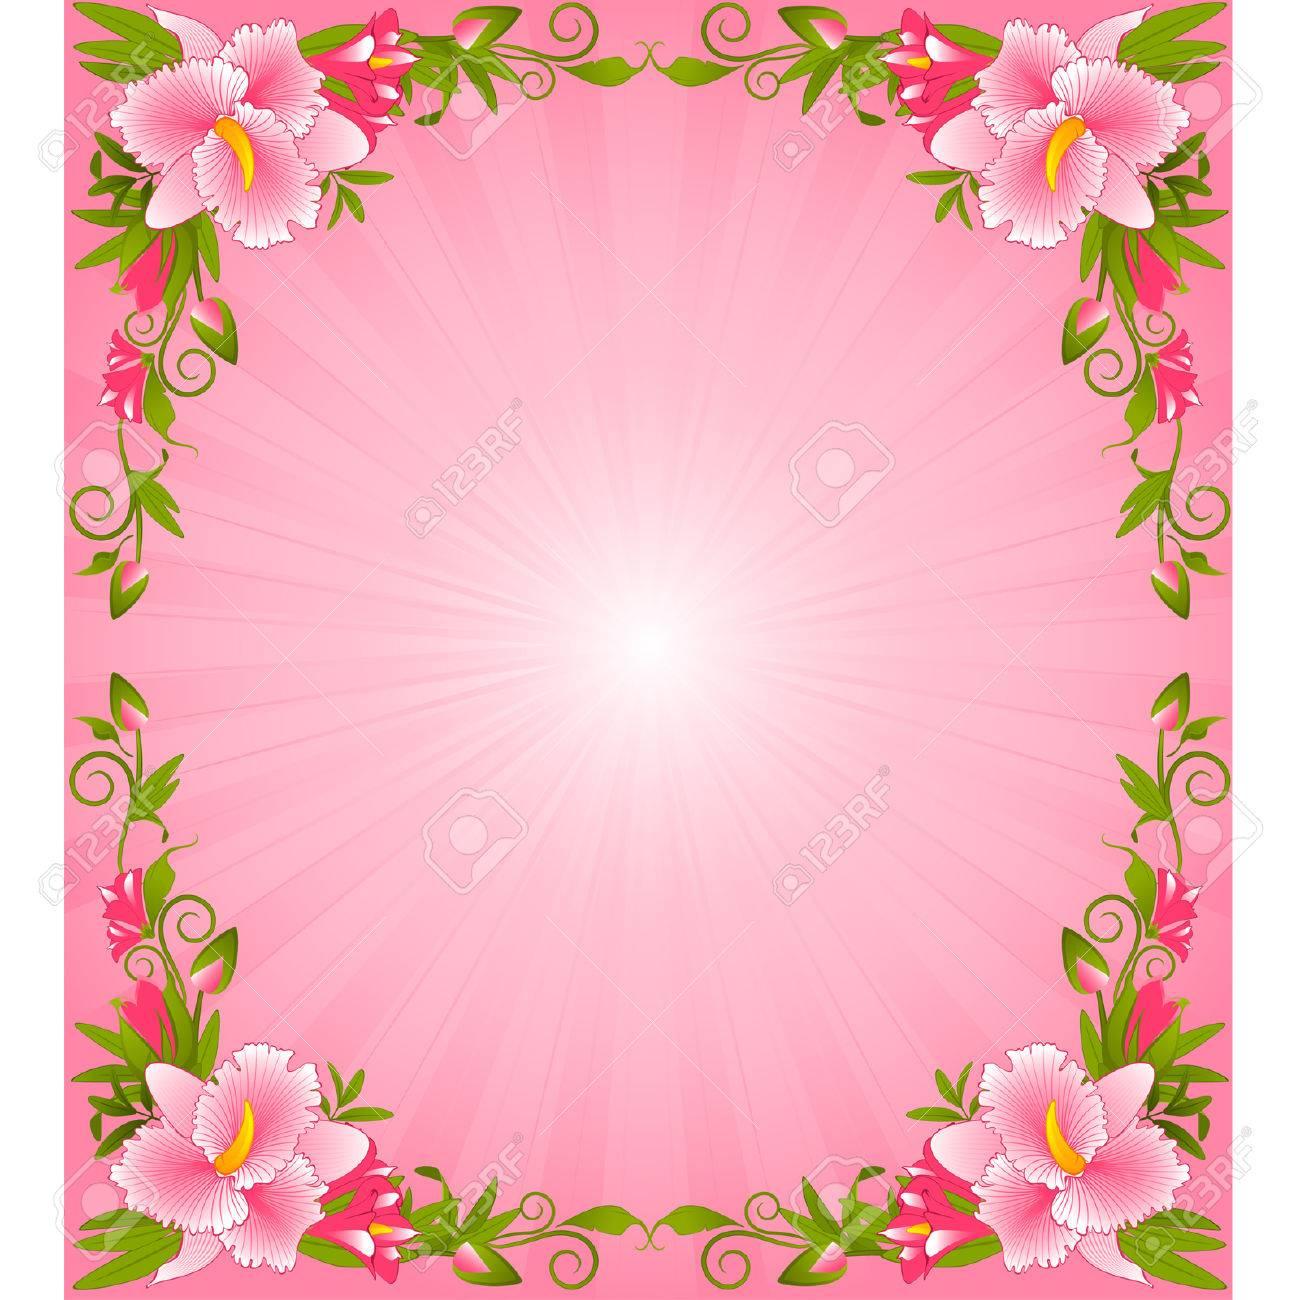 Images pretty flower borders beautiful frangipani flowers source mightylinksfo